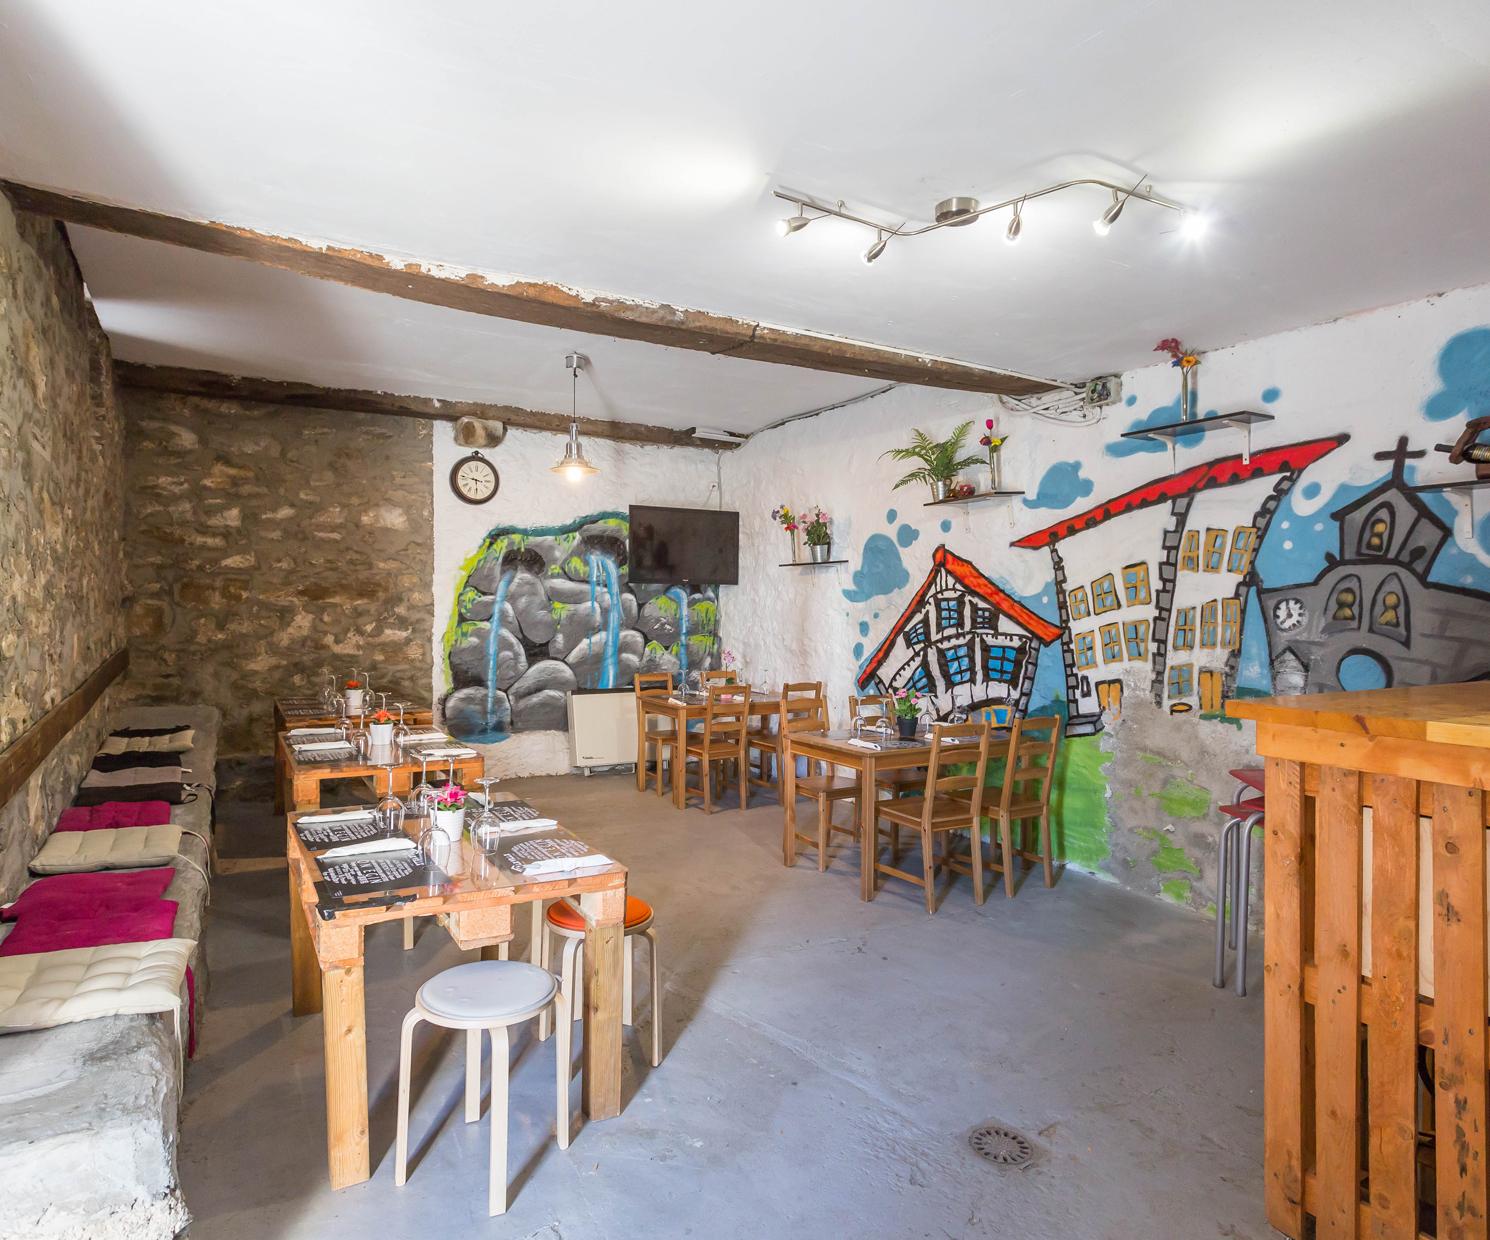 Cocina casera en Navarra